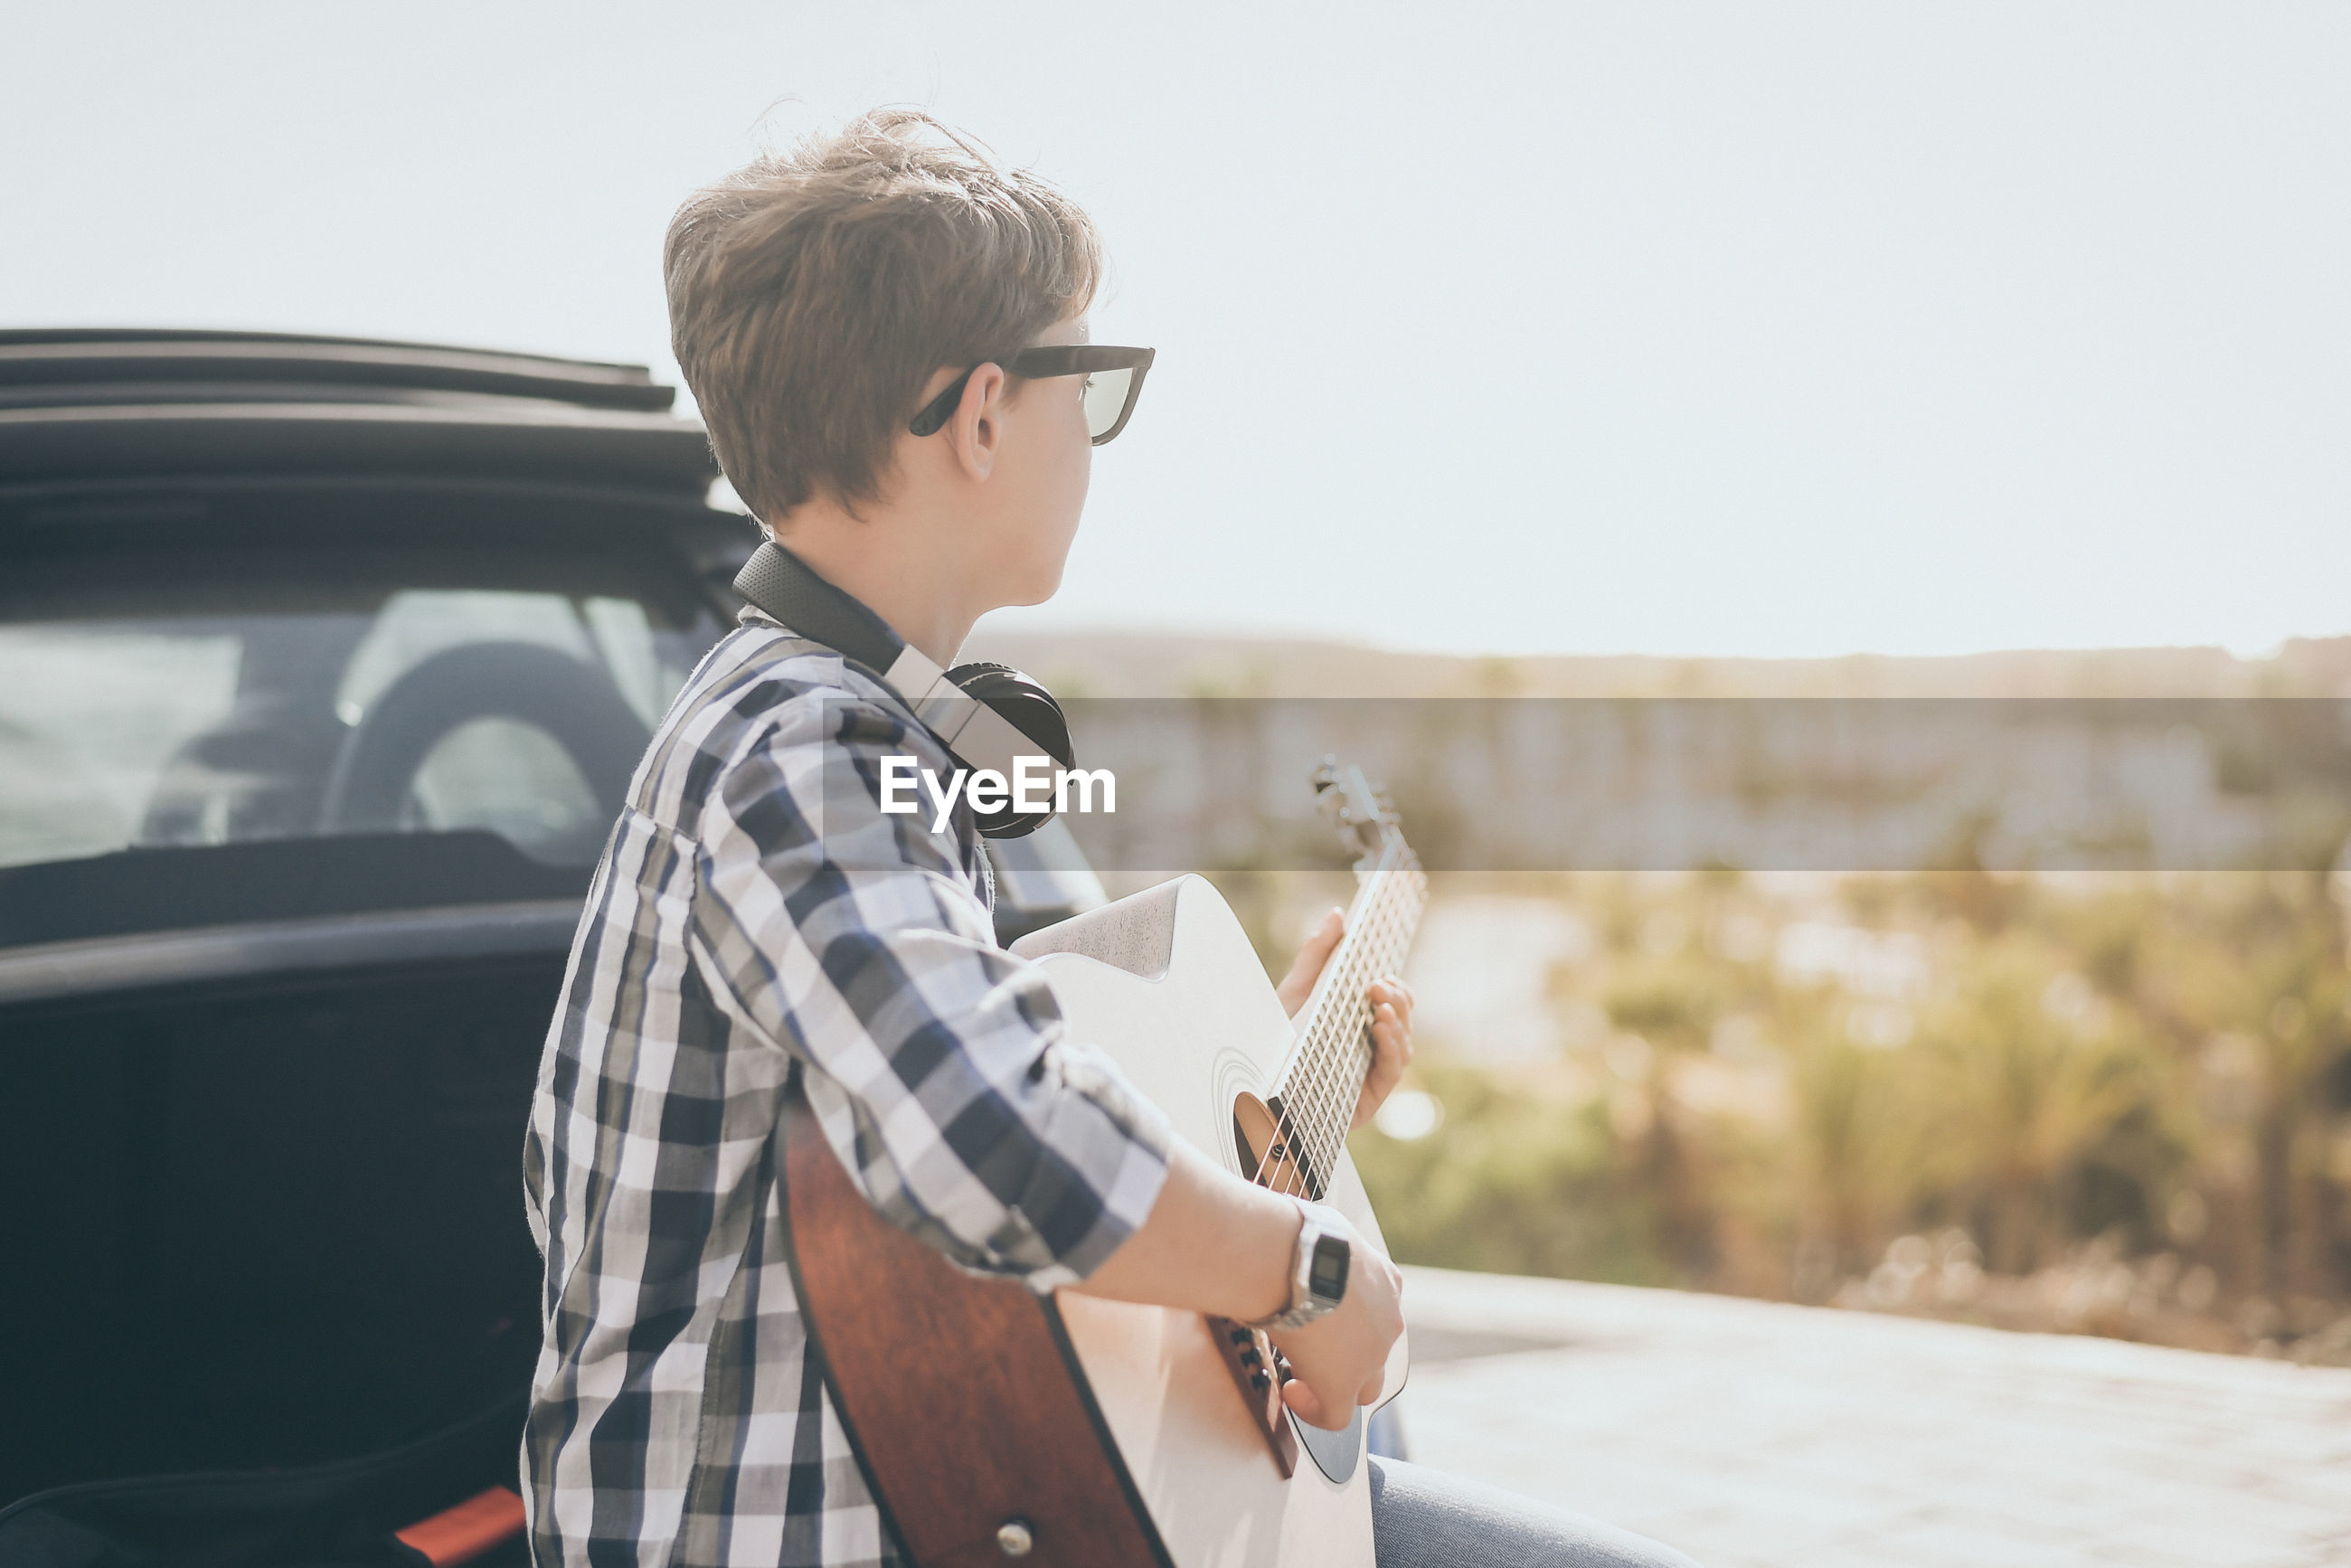 Young boy playing guitar and using smartphone outdoor. teen enjoying music